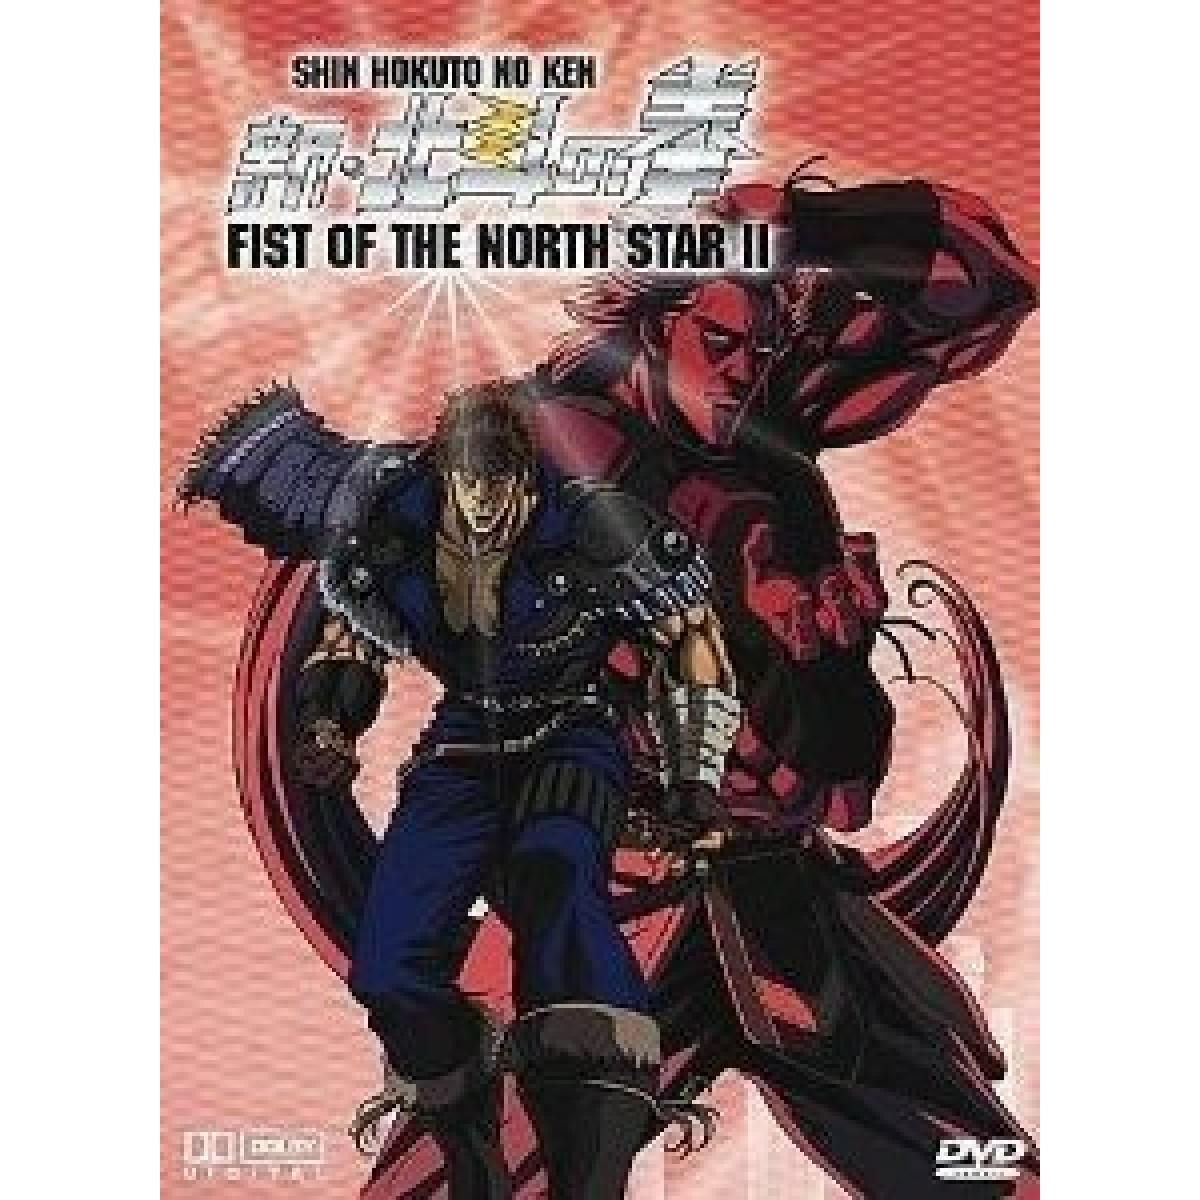 Fist Of The North Star OVA 3er DVD Komplett-Set DigiPack